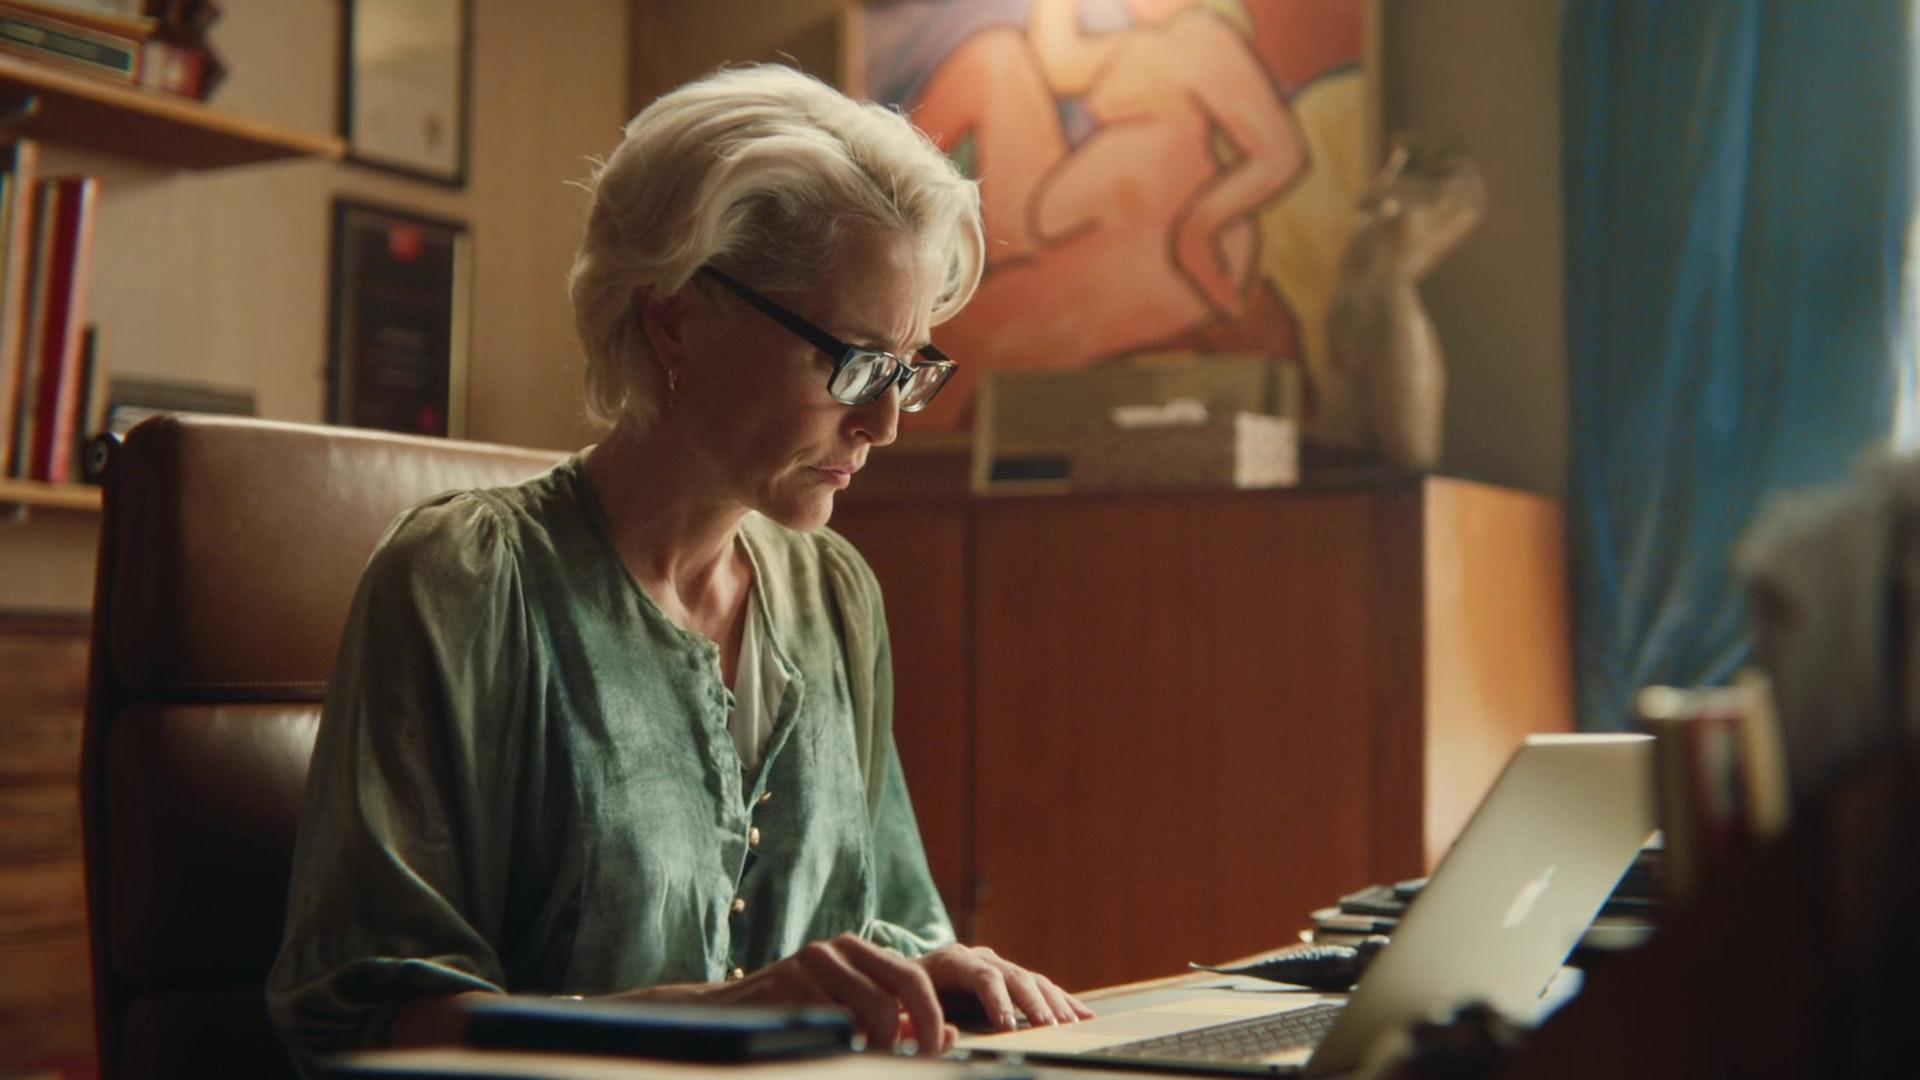 Apple-MacBook-Laptop-Used-by-Gillian-Anderson-as-Dr-Jean-F.-Milburn-in-Sex-Education-1